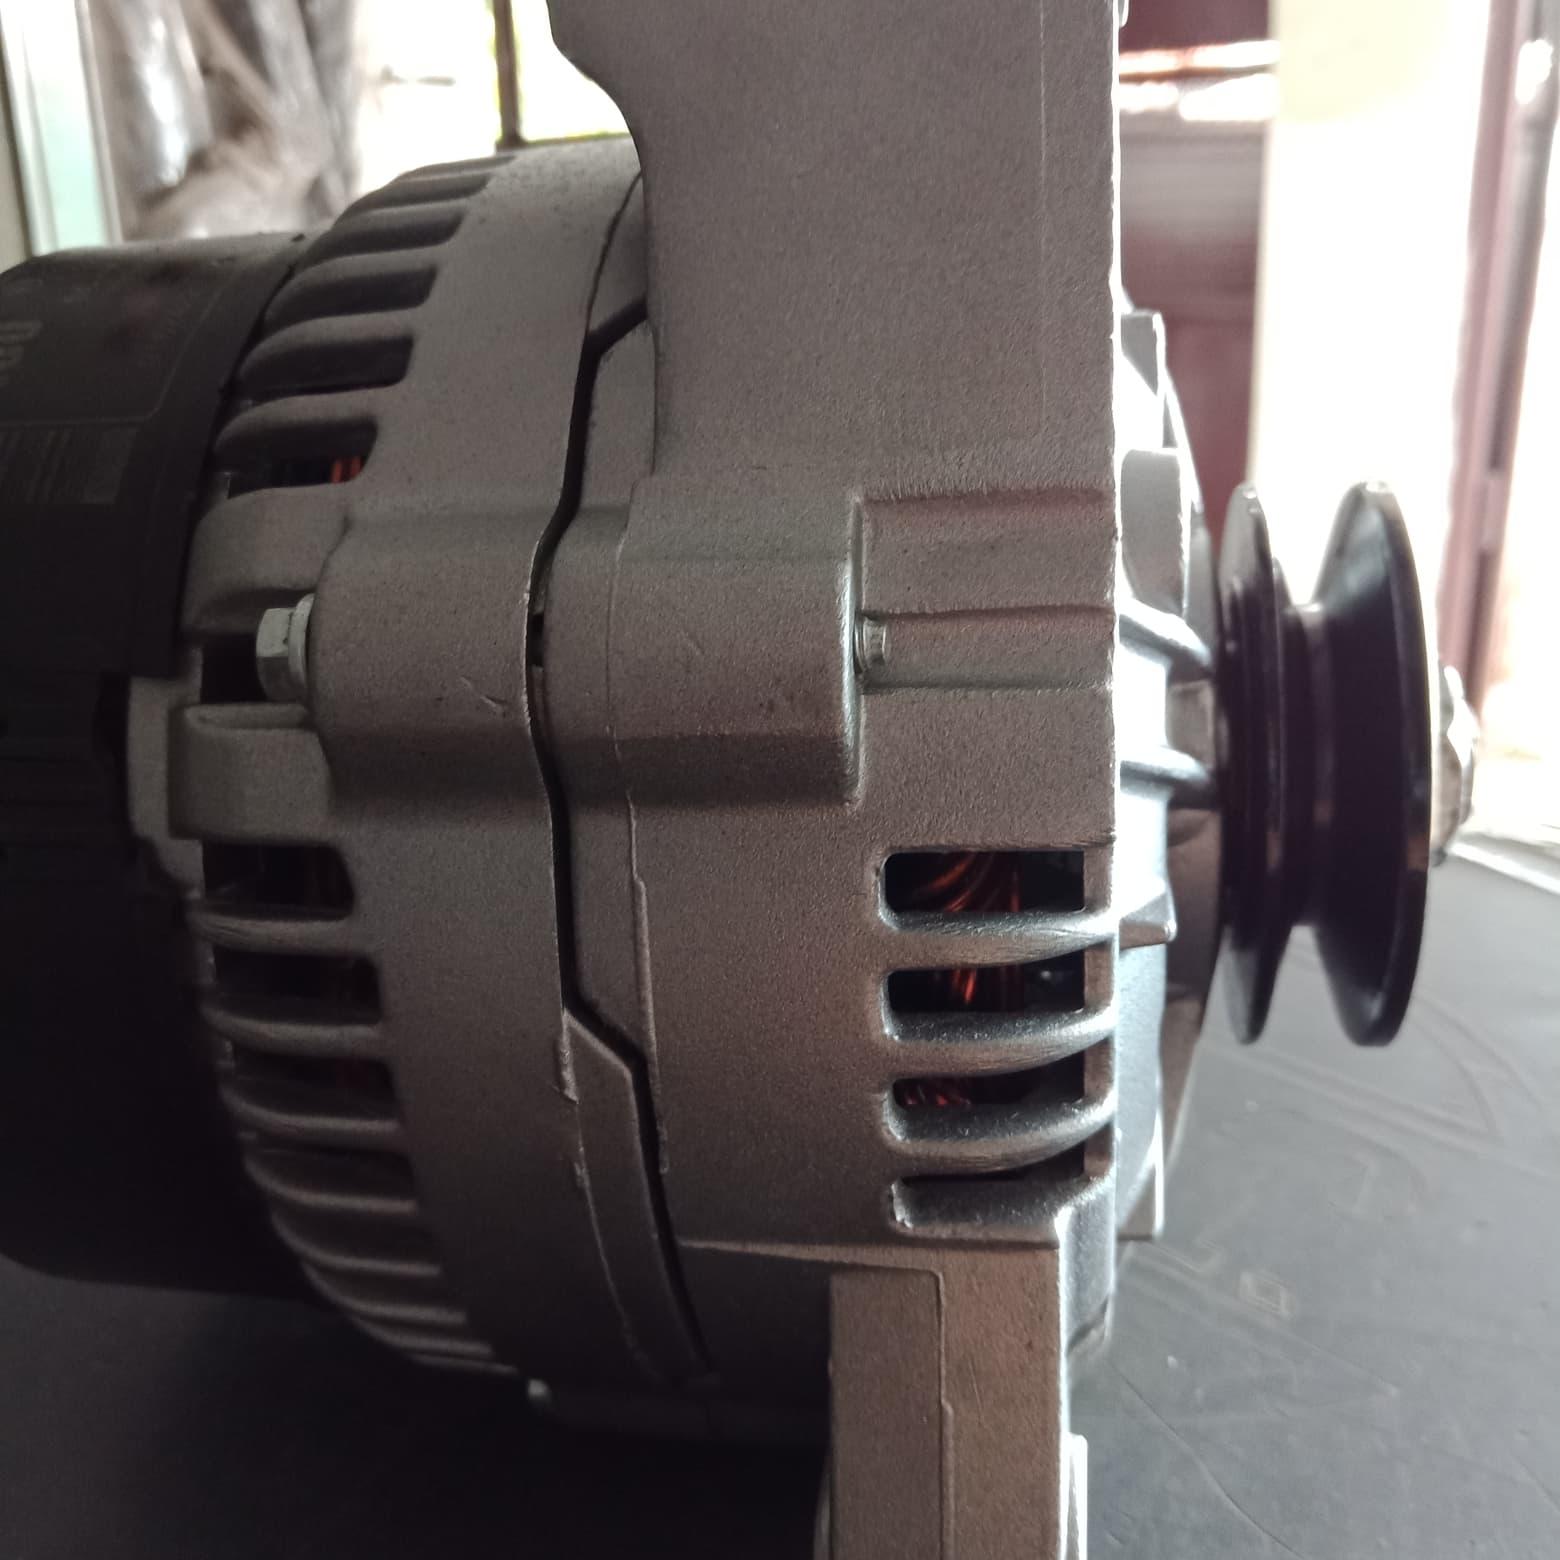 hight resolution of jual alternator dinamo ampere 100a jeep cj7 kota surabaya spare part jeep tokopedia